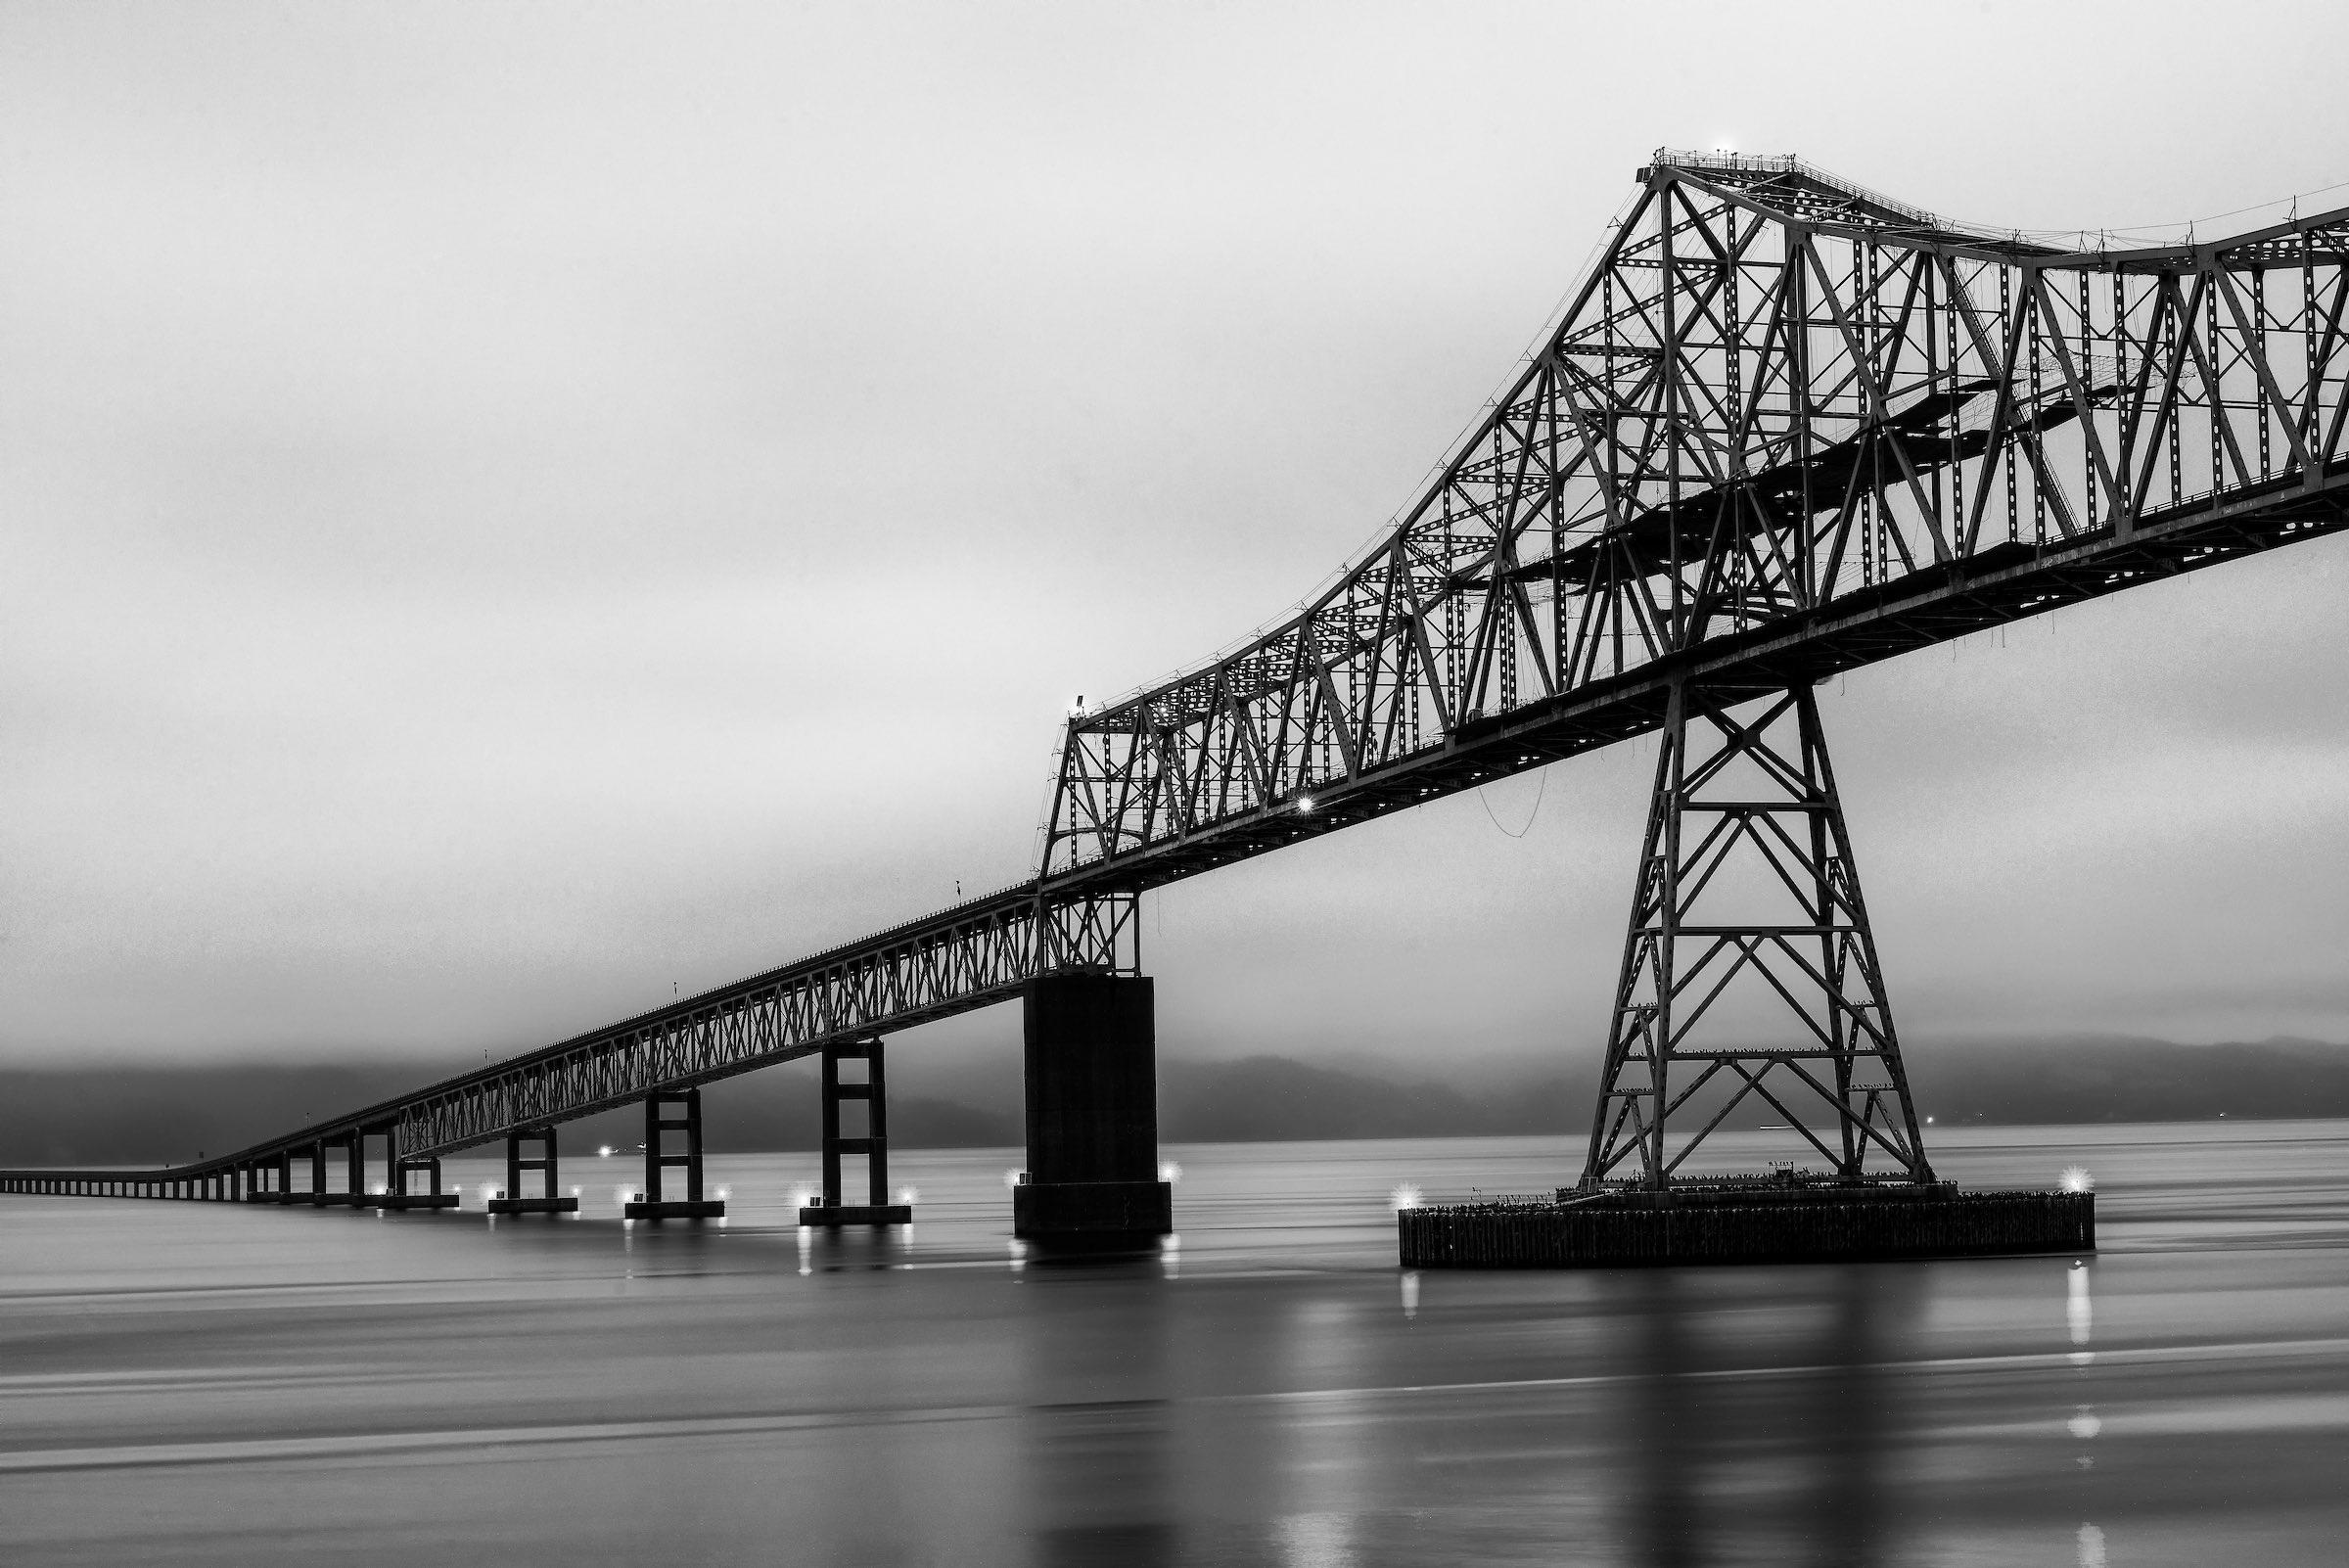 ASTORIA BRIDGE. © 2019 GIVEN PHOTOGRAPHY